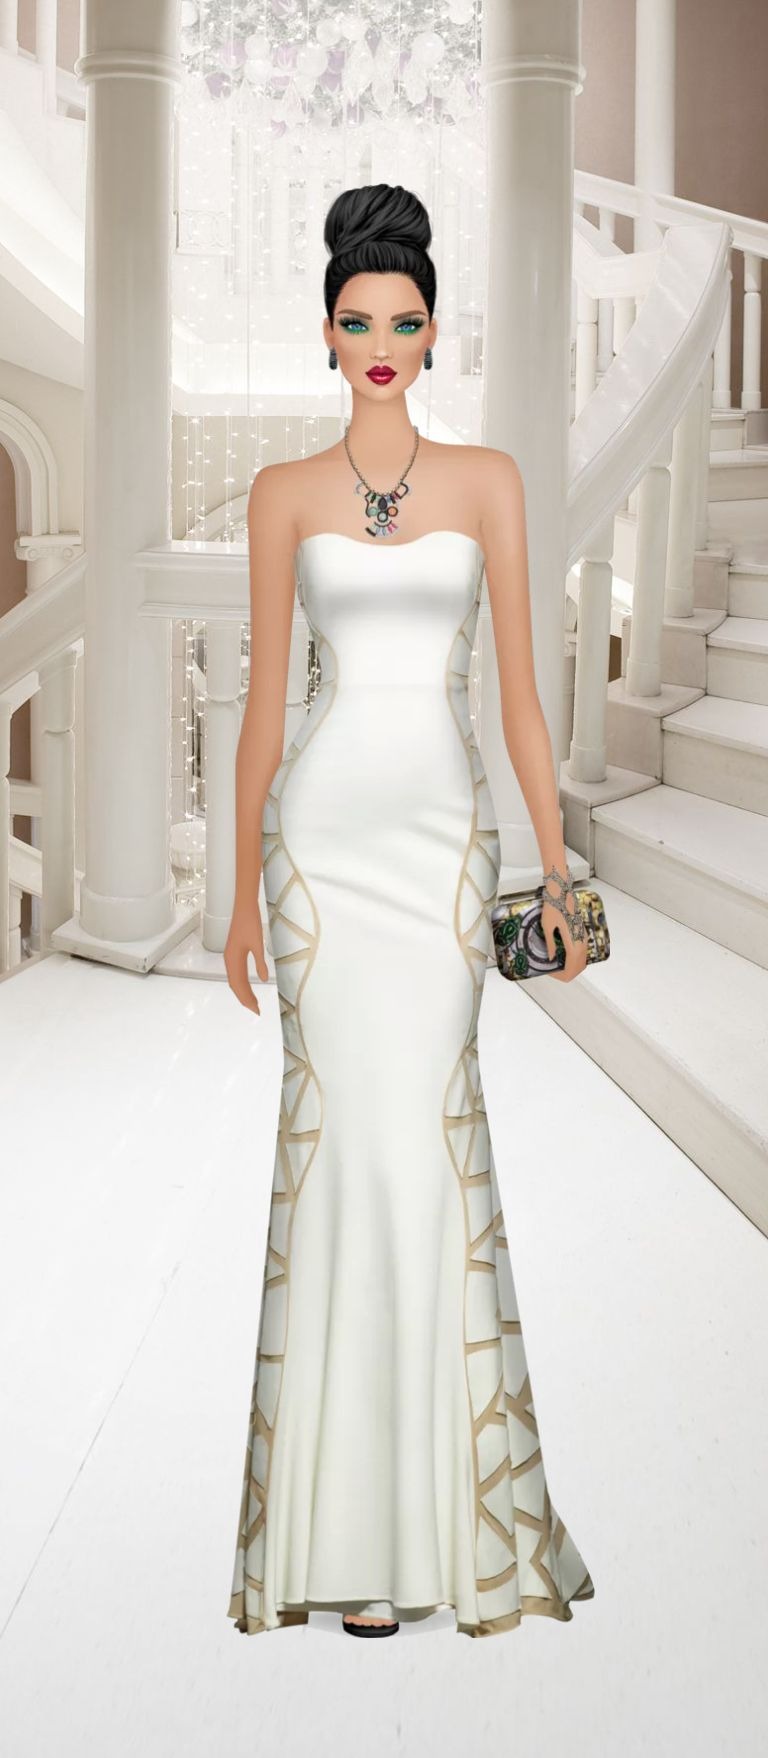 Wedding Dress Designers Game.Wedding Dress Fashion Design Games Lixnet Ag